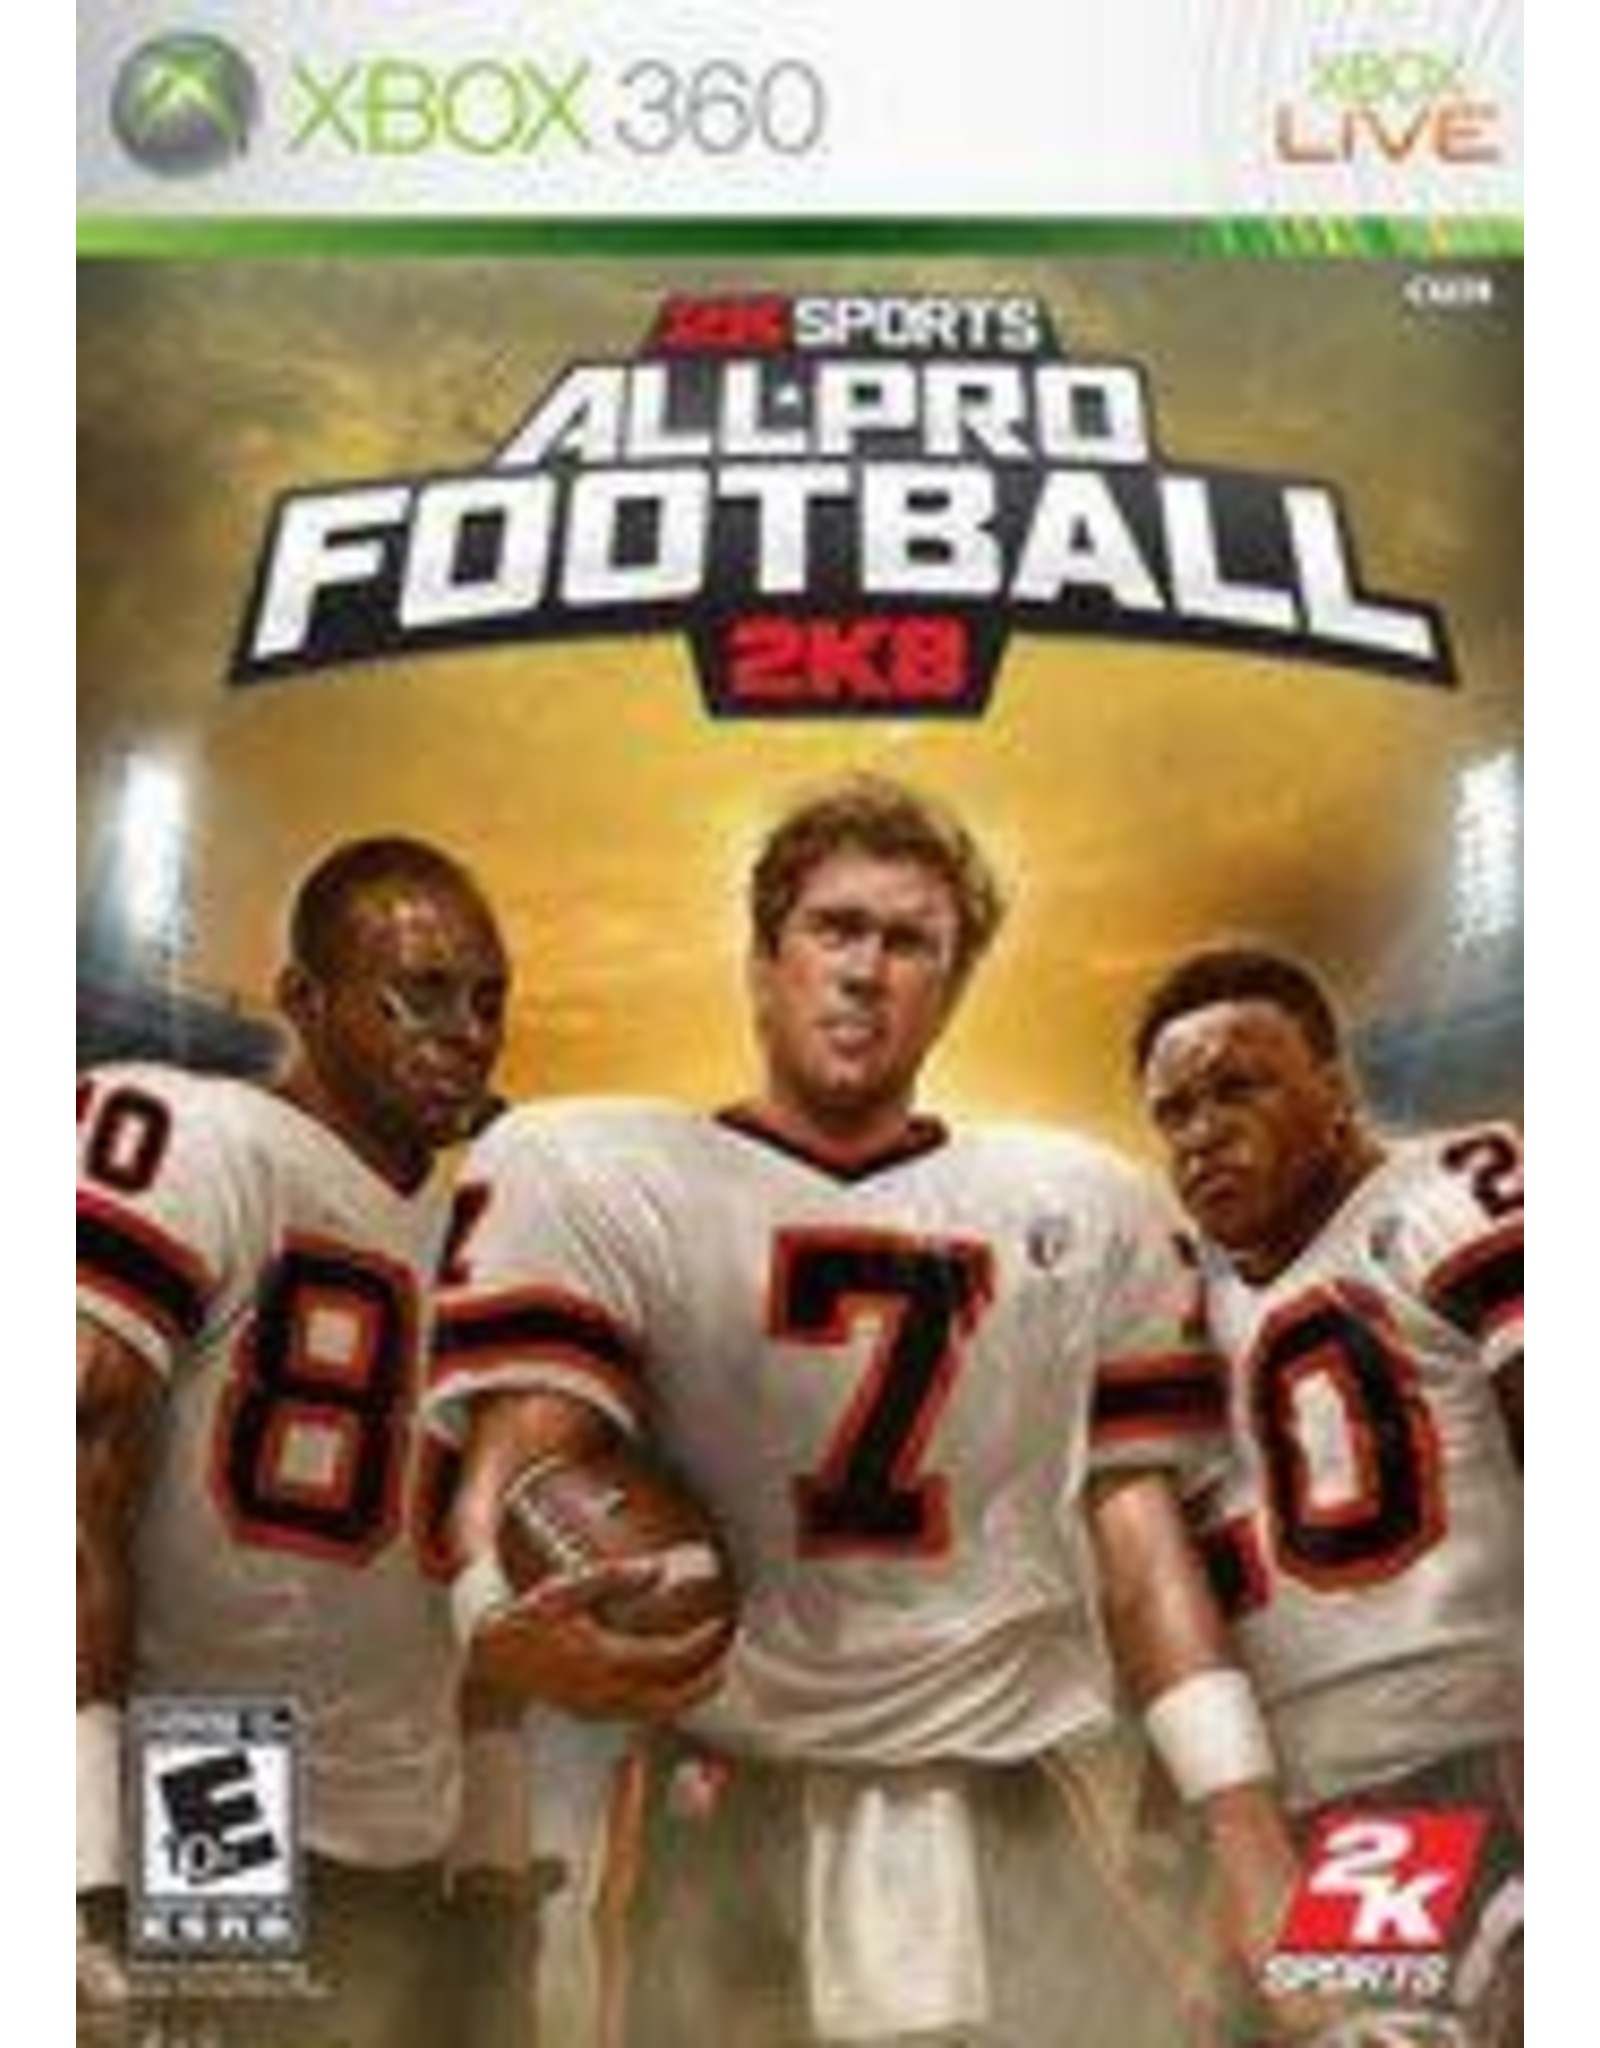 Xbox 360 All Pro Football 2K8 (CiB)